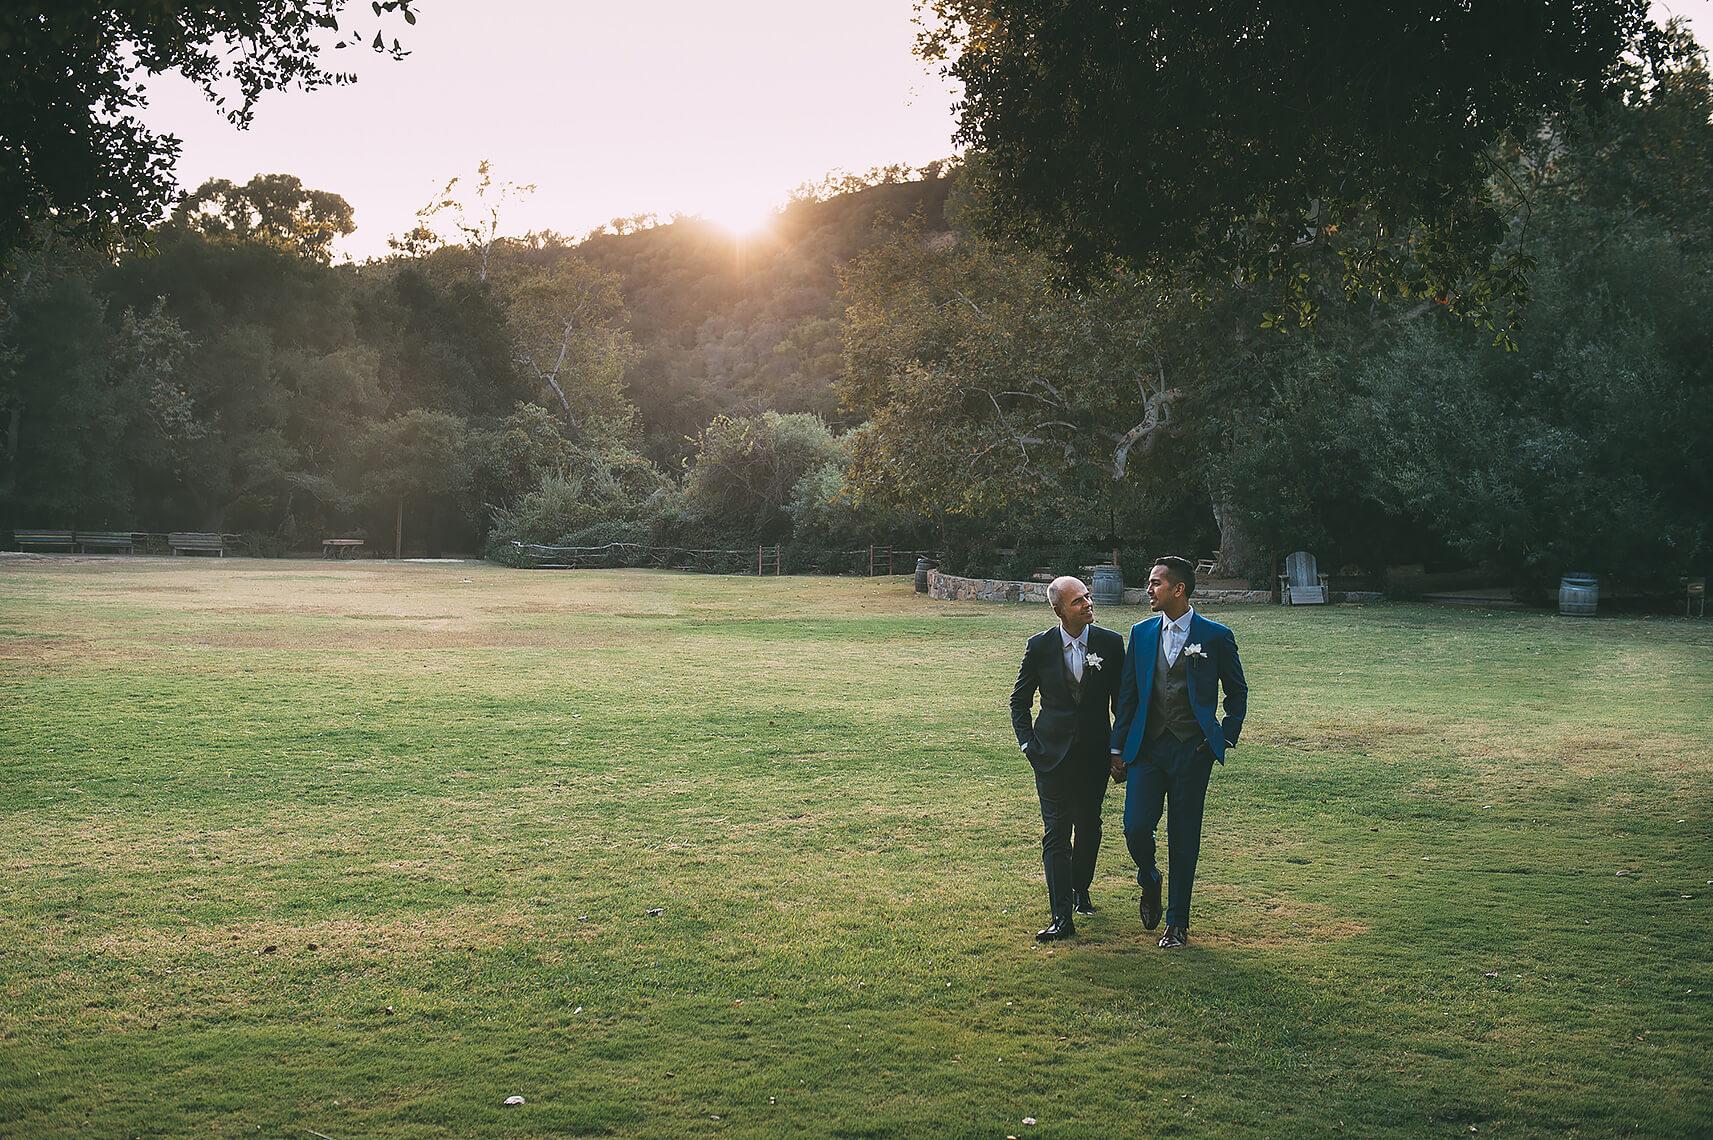 malibu-calamigos-ranch-same-sex-wedding-photographer-los-angeles-20.jpg